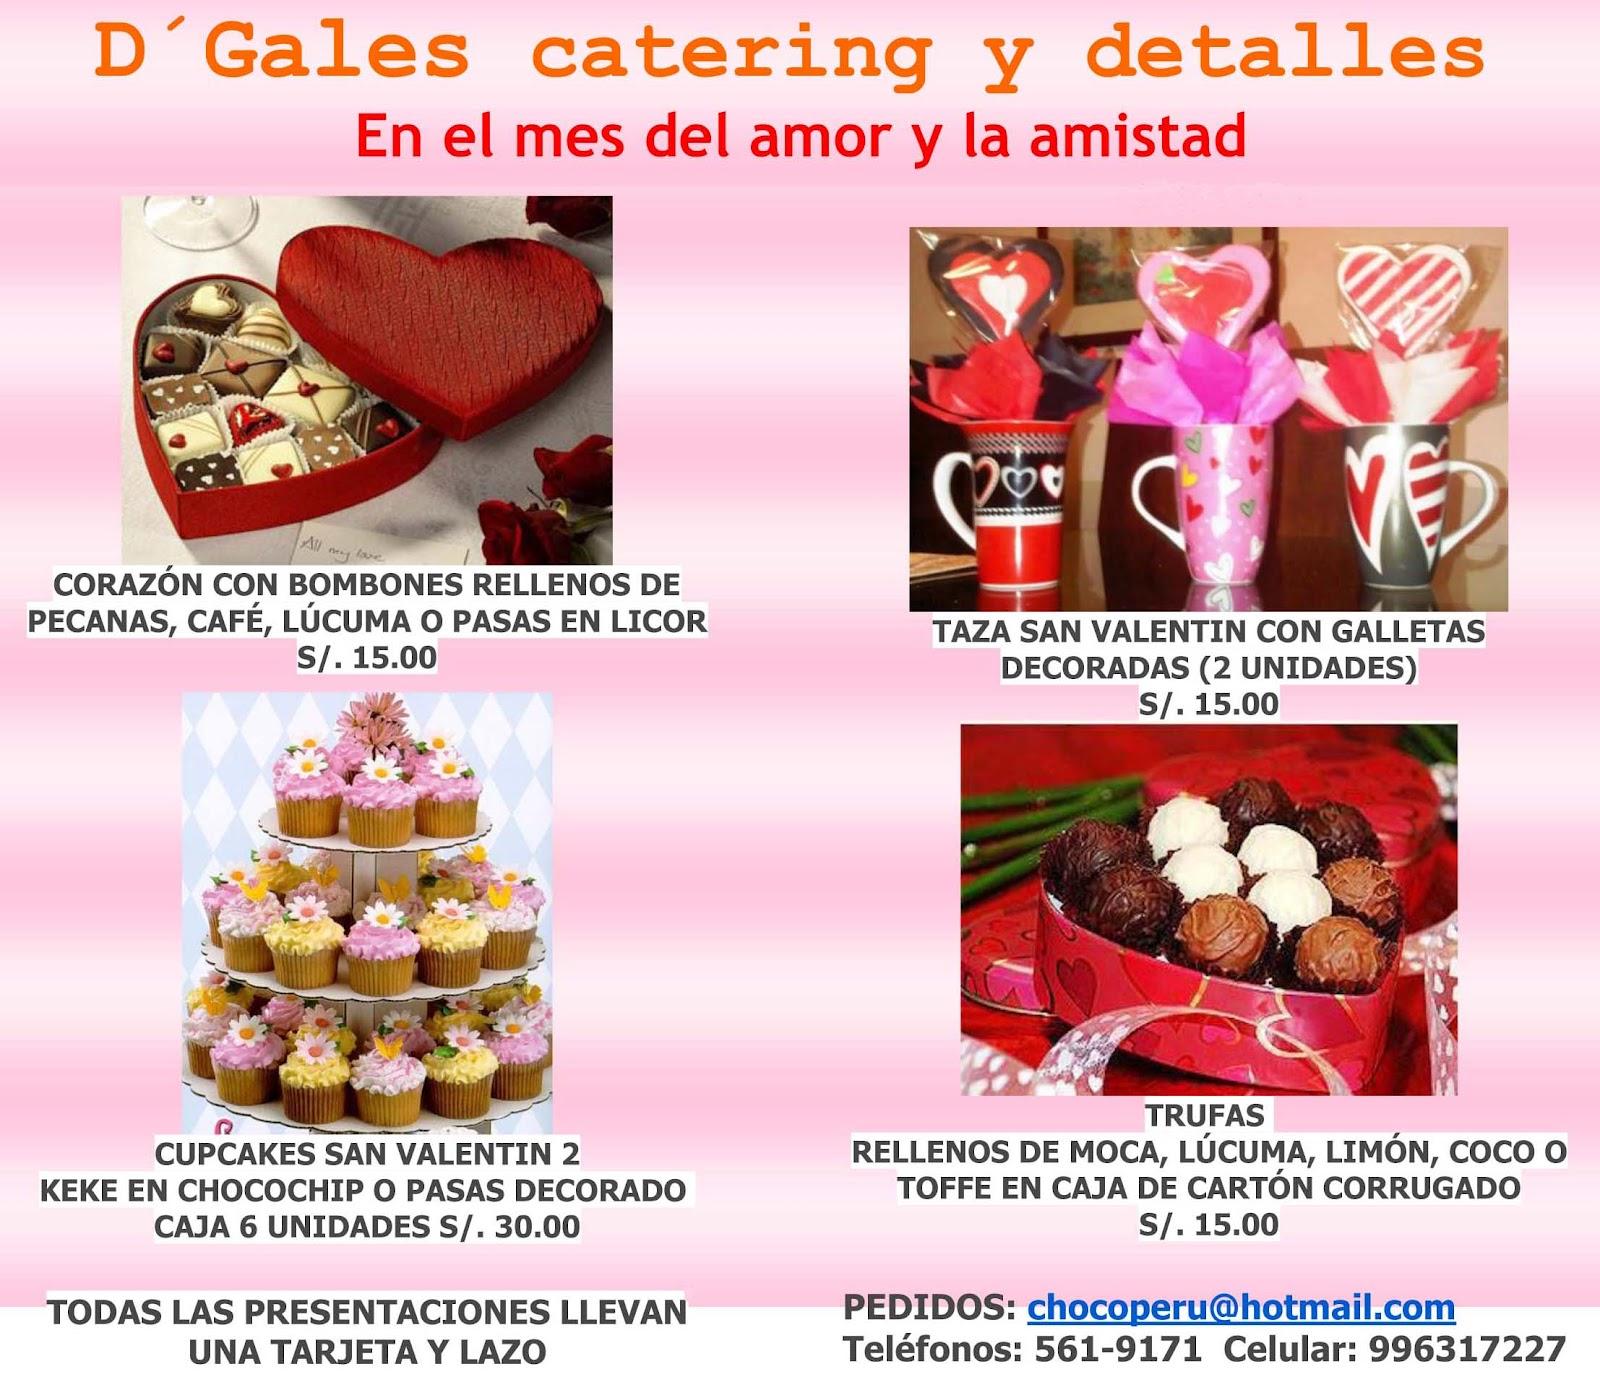 D gales catering y detalles detalles para el hogar d gales for Detalles para el hogar